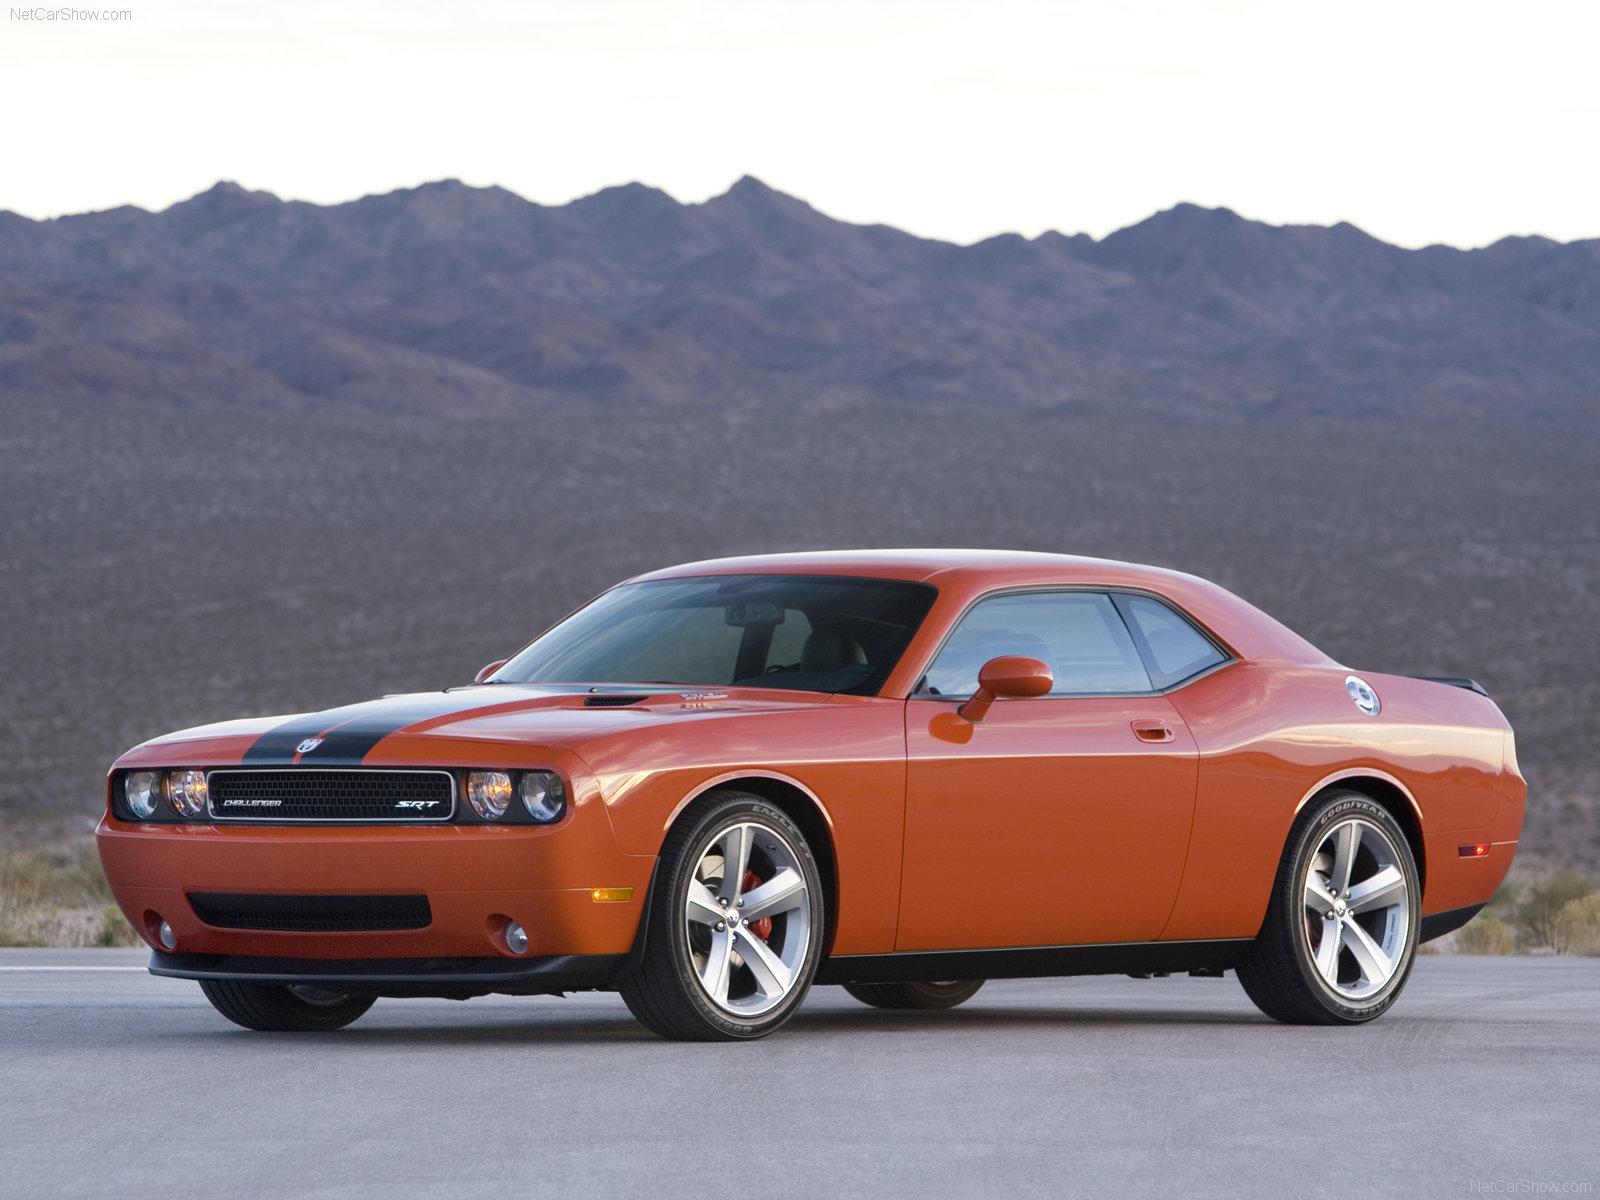 Dodge Challenger Srt8 Core Dodge Challenger Srt8 Core